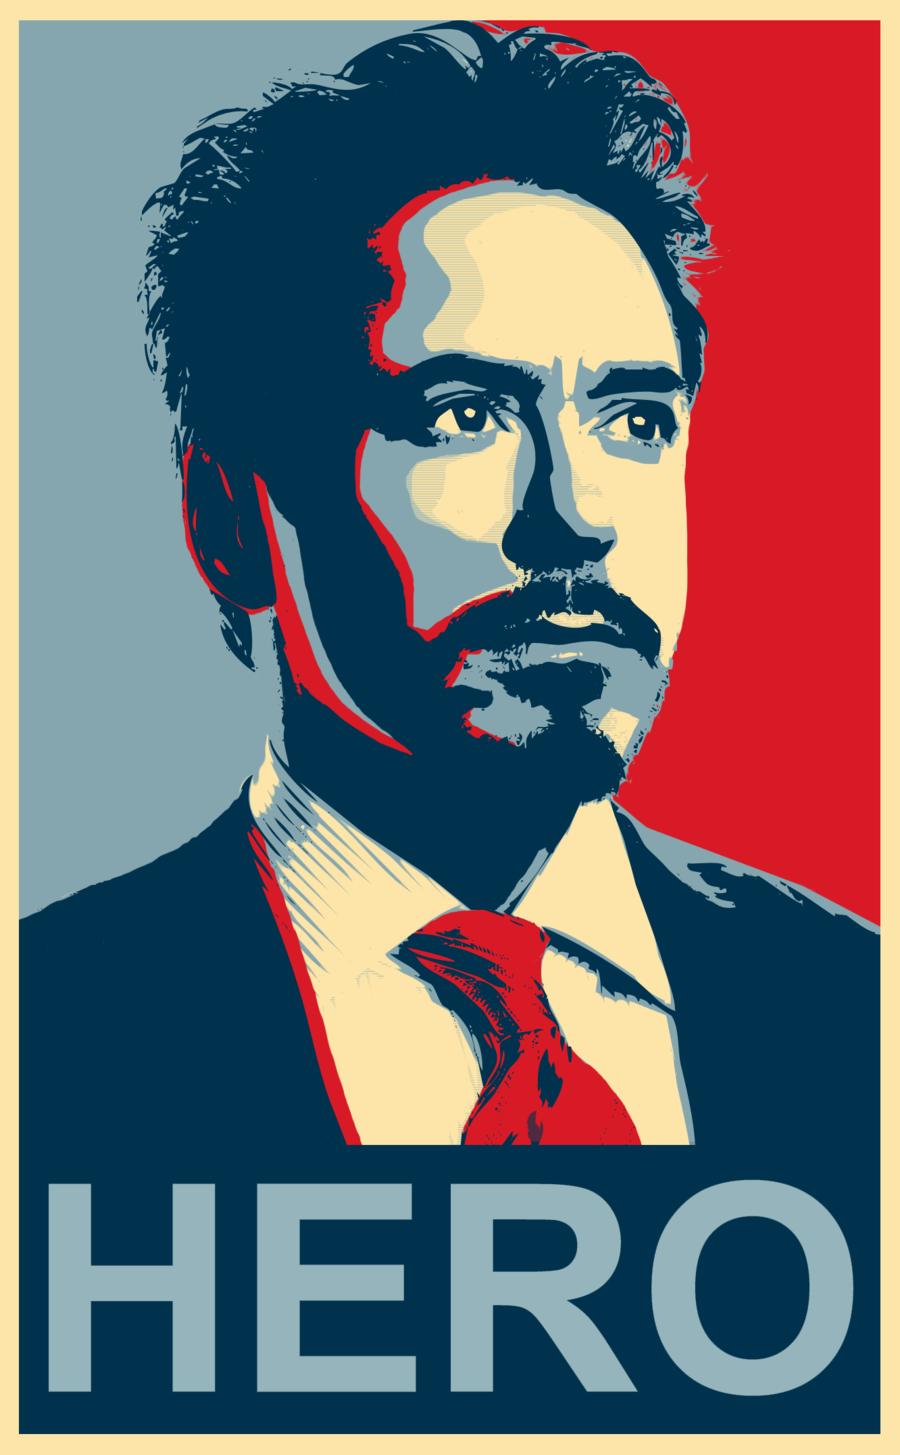 tony stark ftw! | geek chic | pinterest | tony stark, iron man and